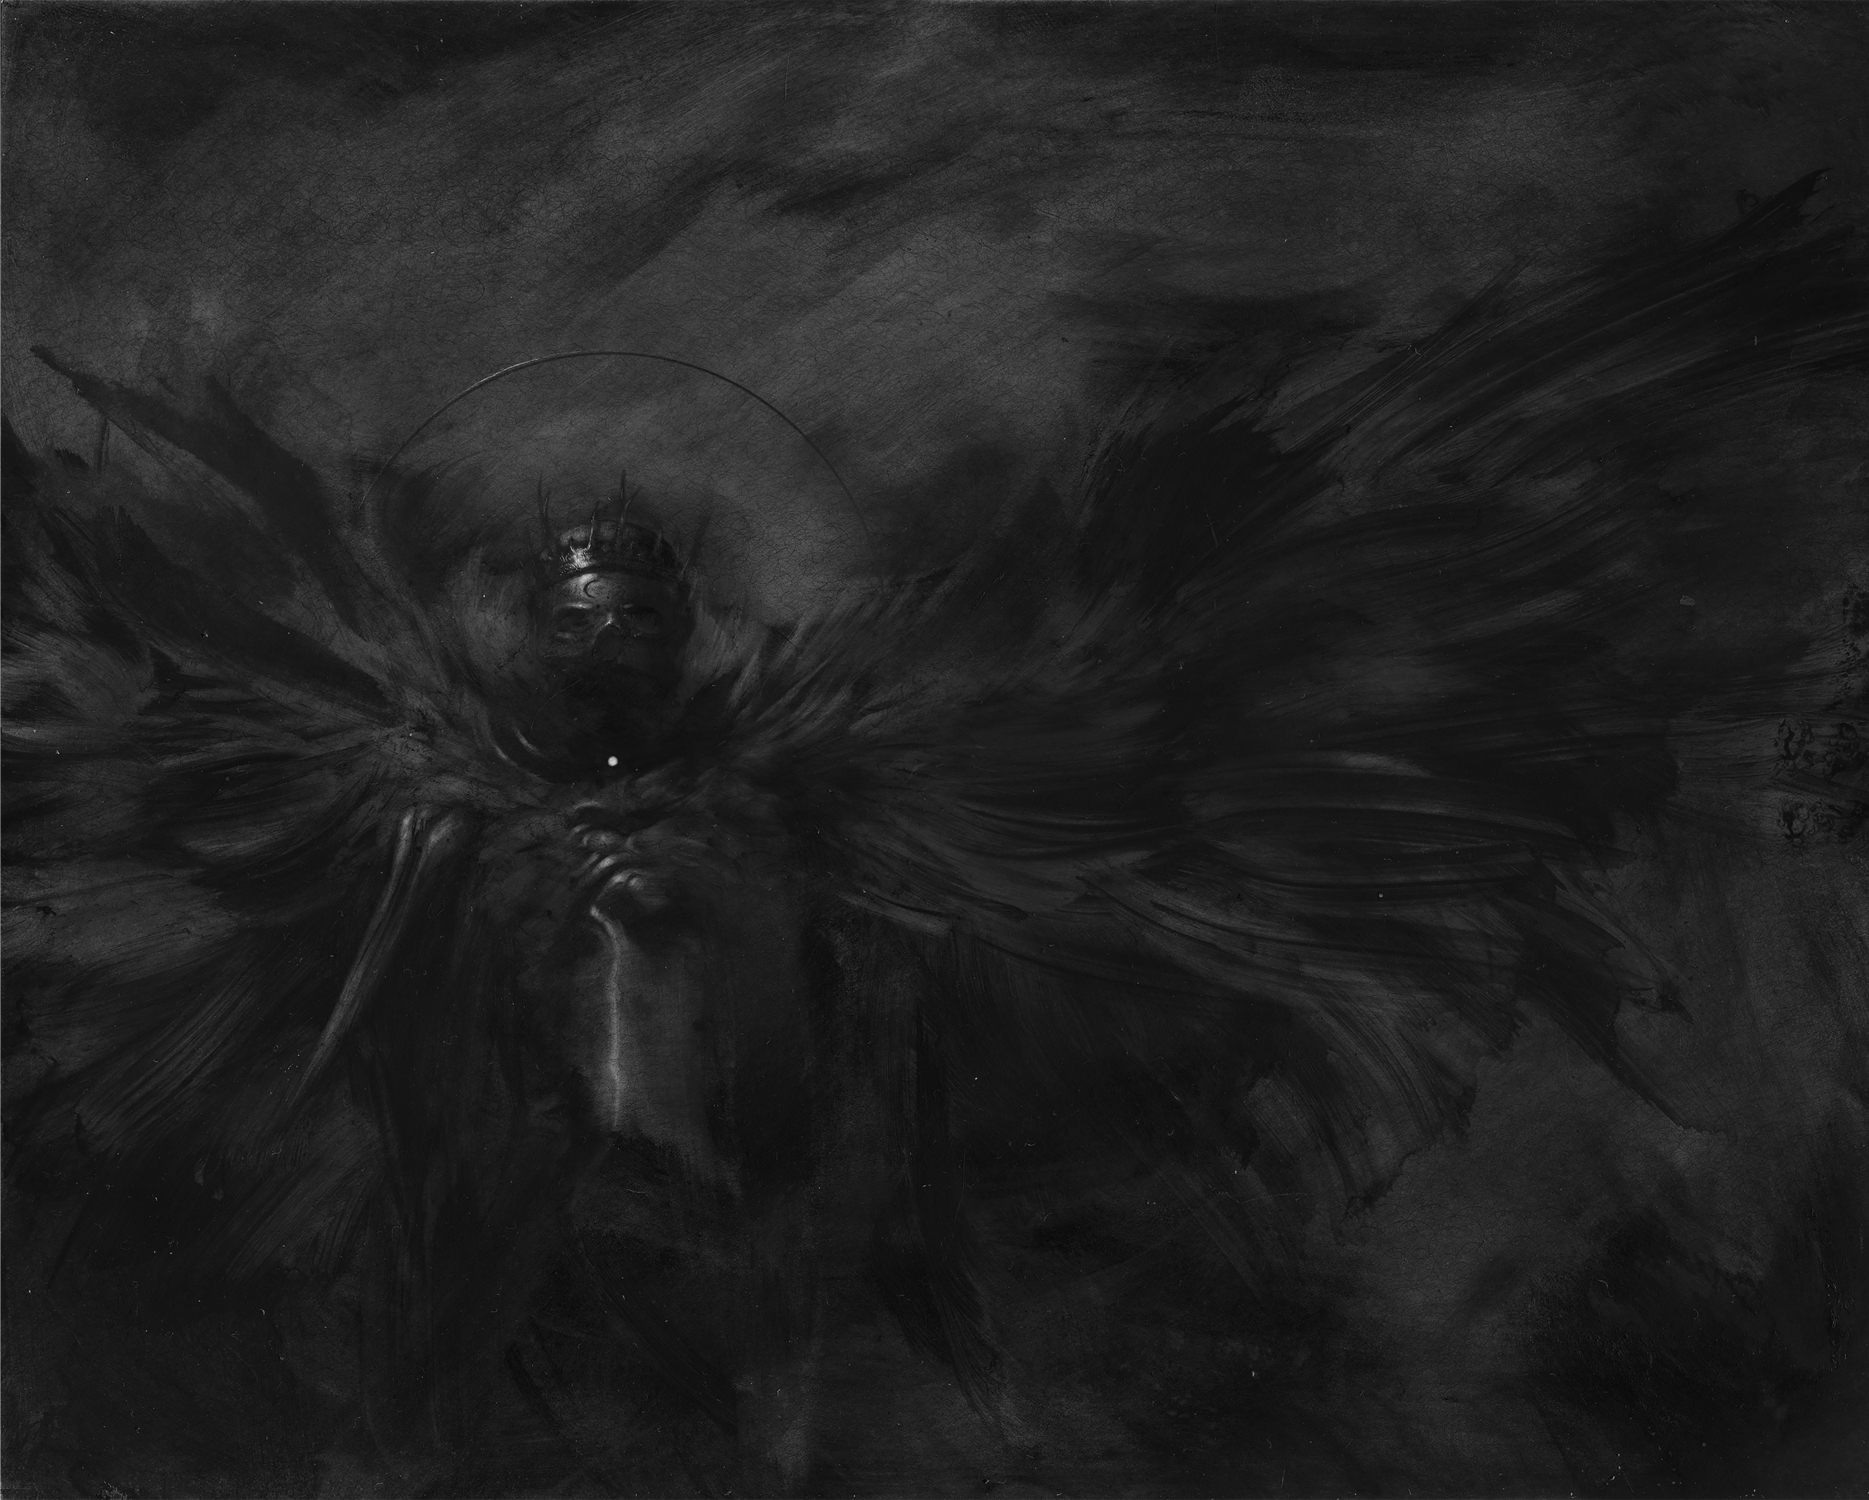 The Storms: Lightening Artwork by Allen Williams